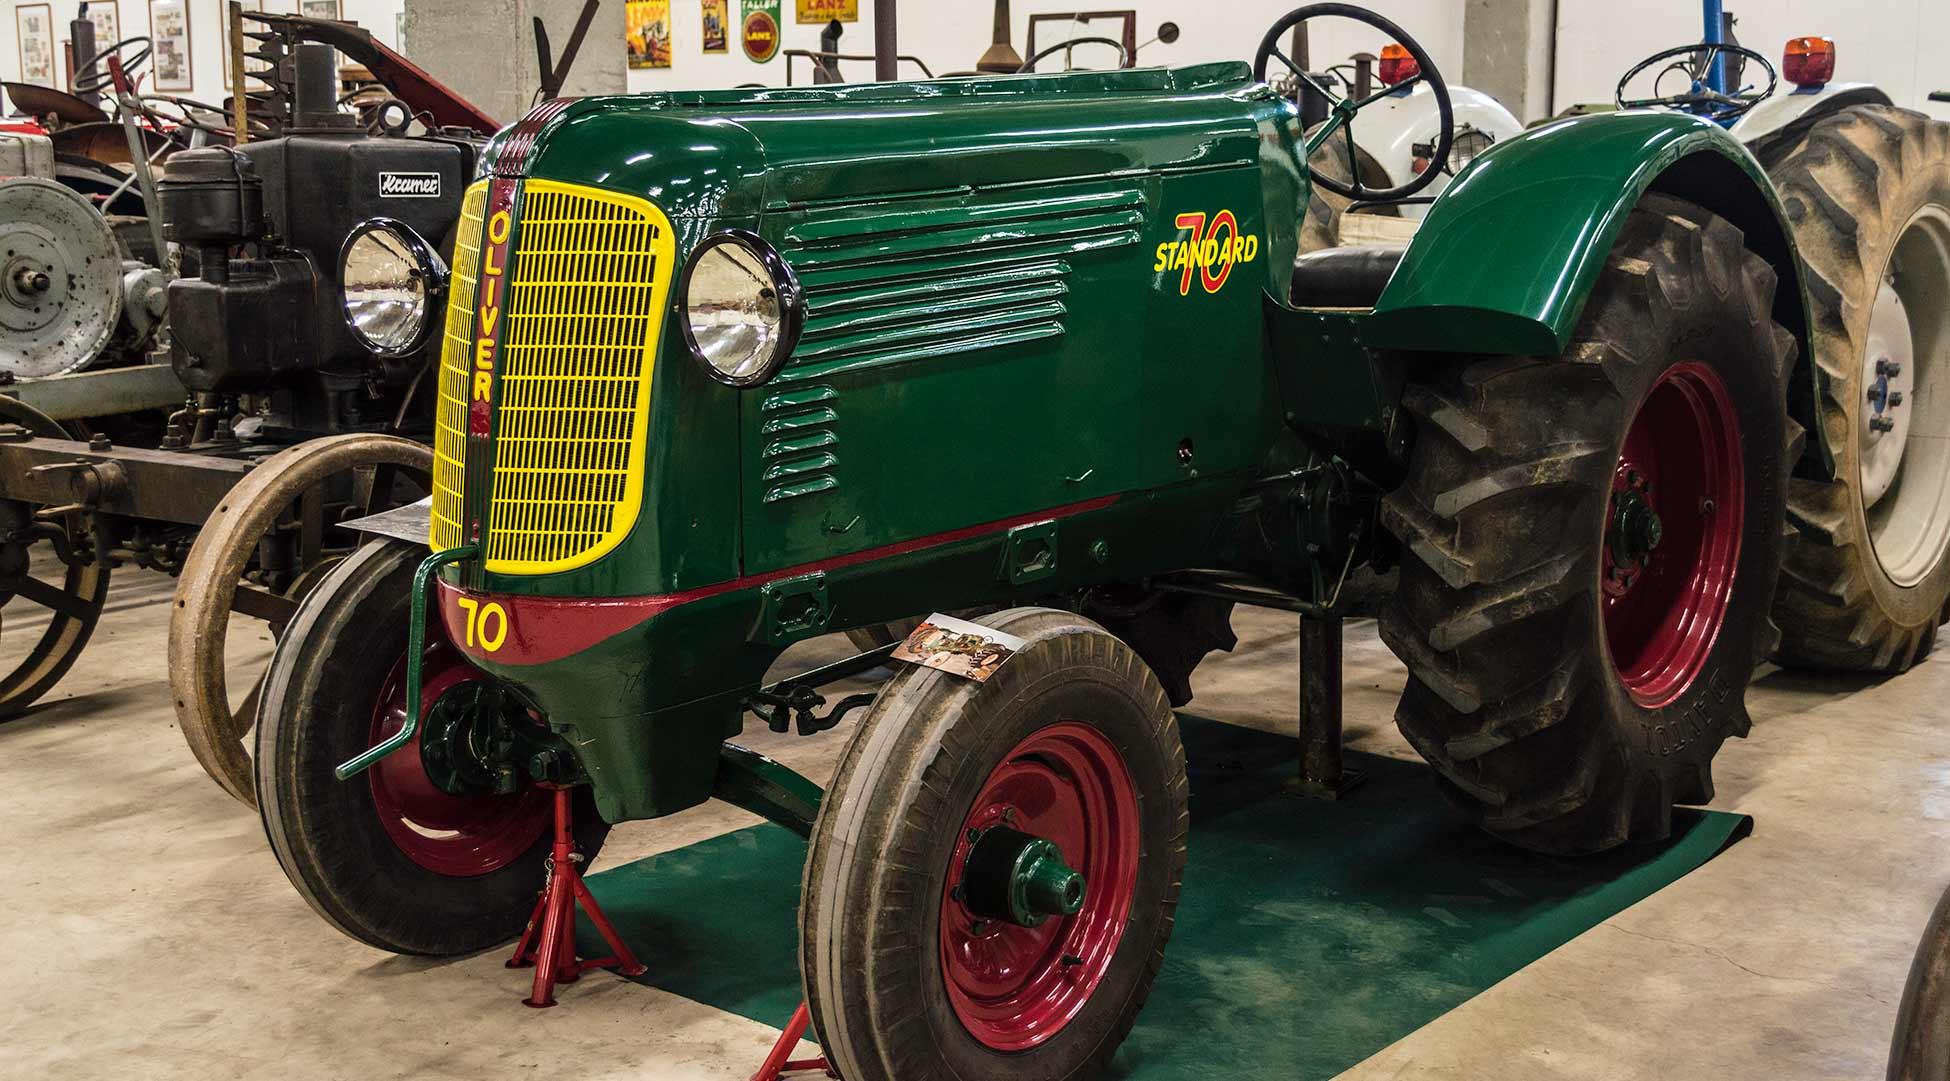 oliver standard 70 museo del tractor de poca. Black Bedroom Furniture Sets. Home Design Ideas